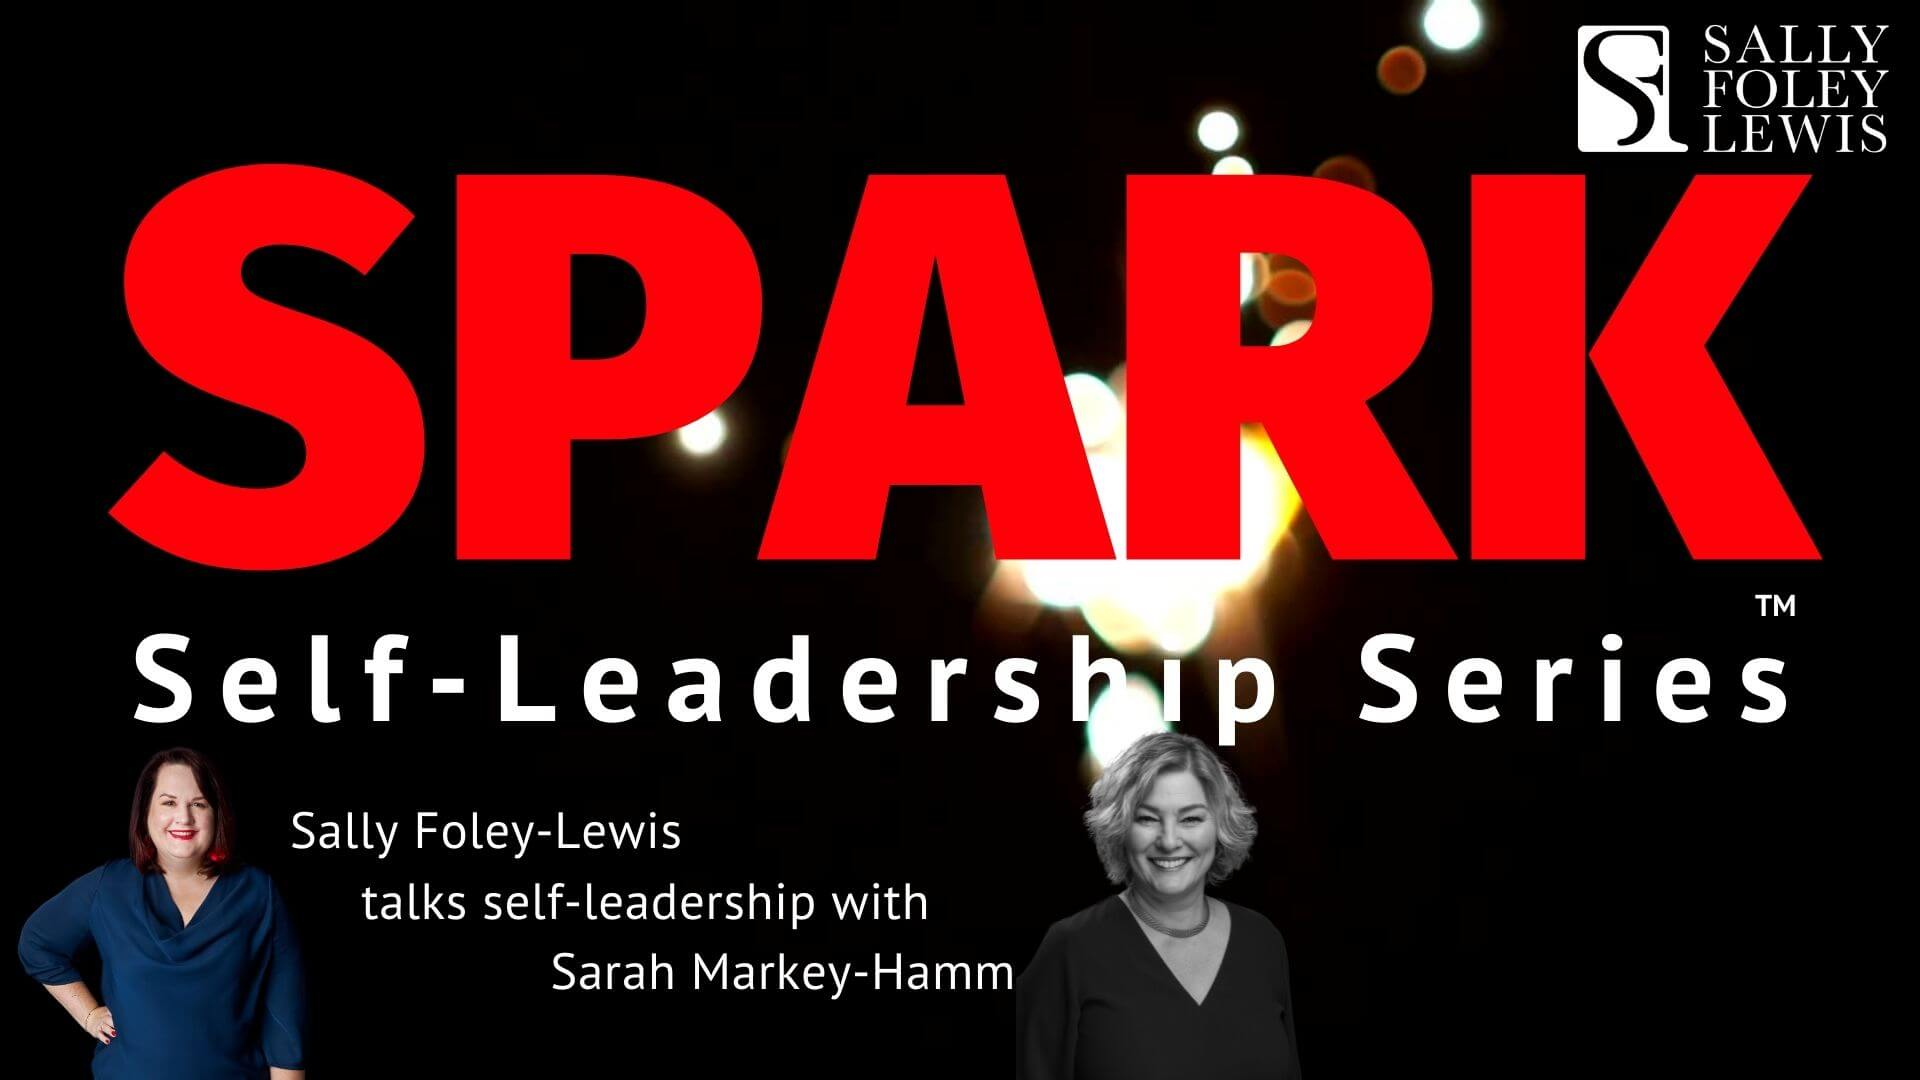 Sarah Markey-Hamm in the Spark Self-Leadership Series